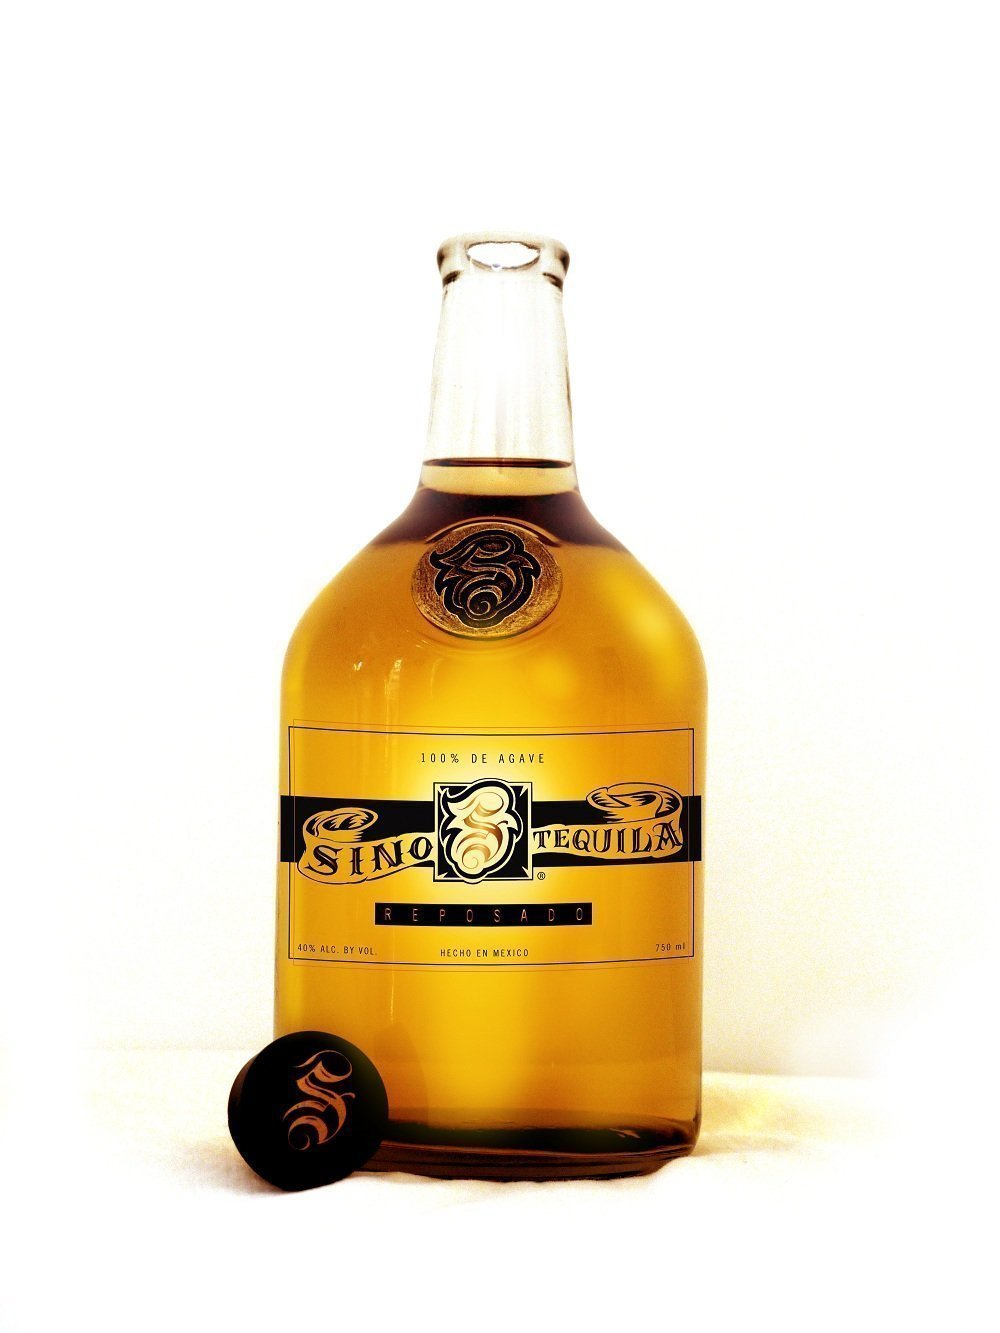 Sino Reposado Tequila